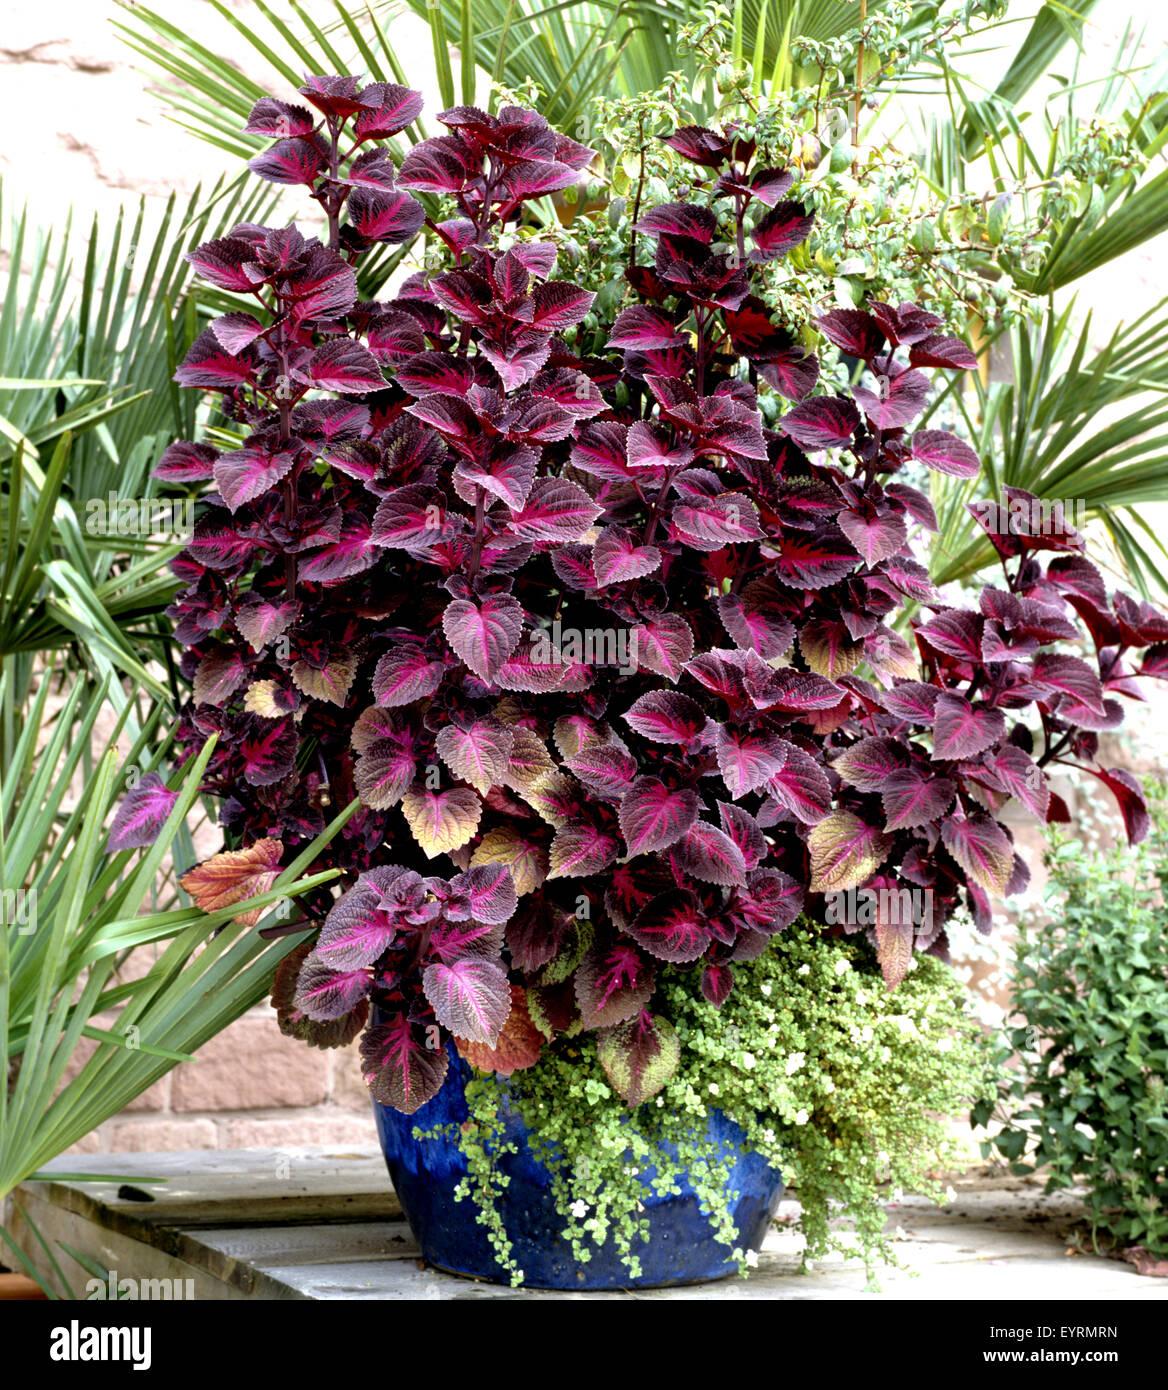 Buntnessel, Coleus, Balkonblumen, Blumen auf Terrasse Stock Photo